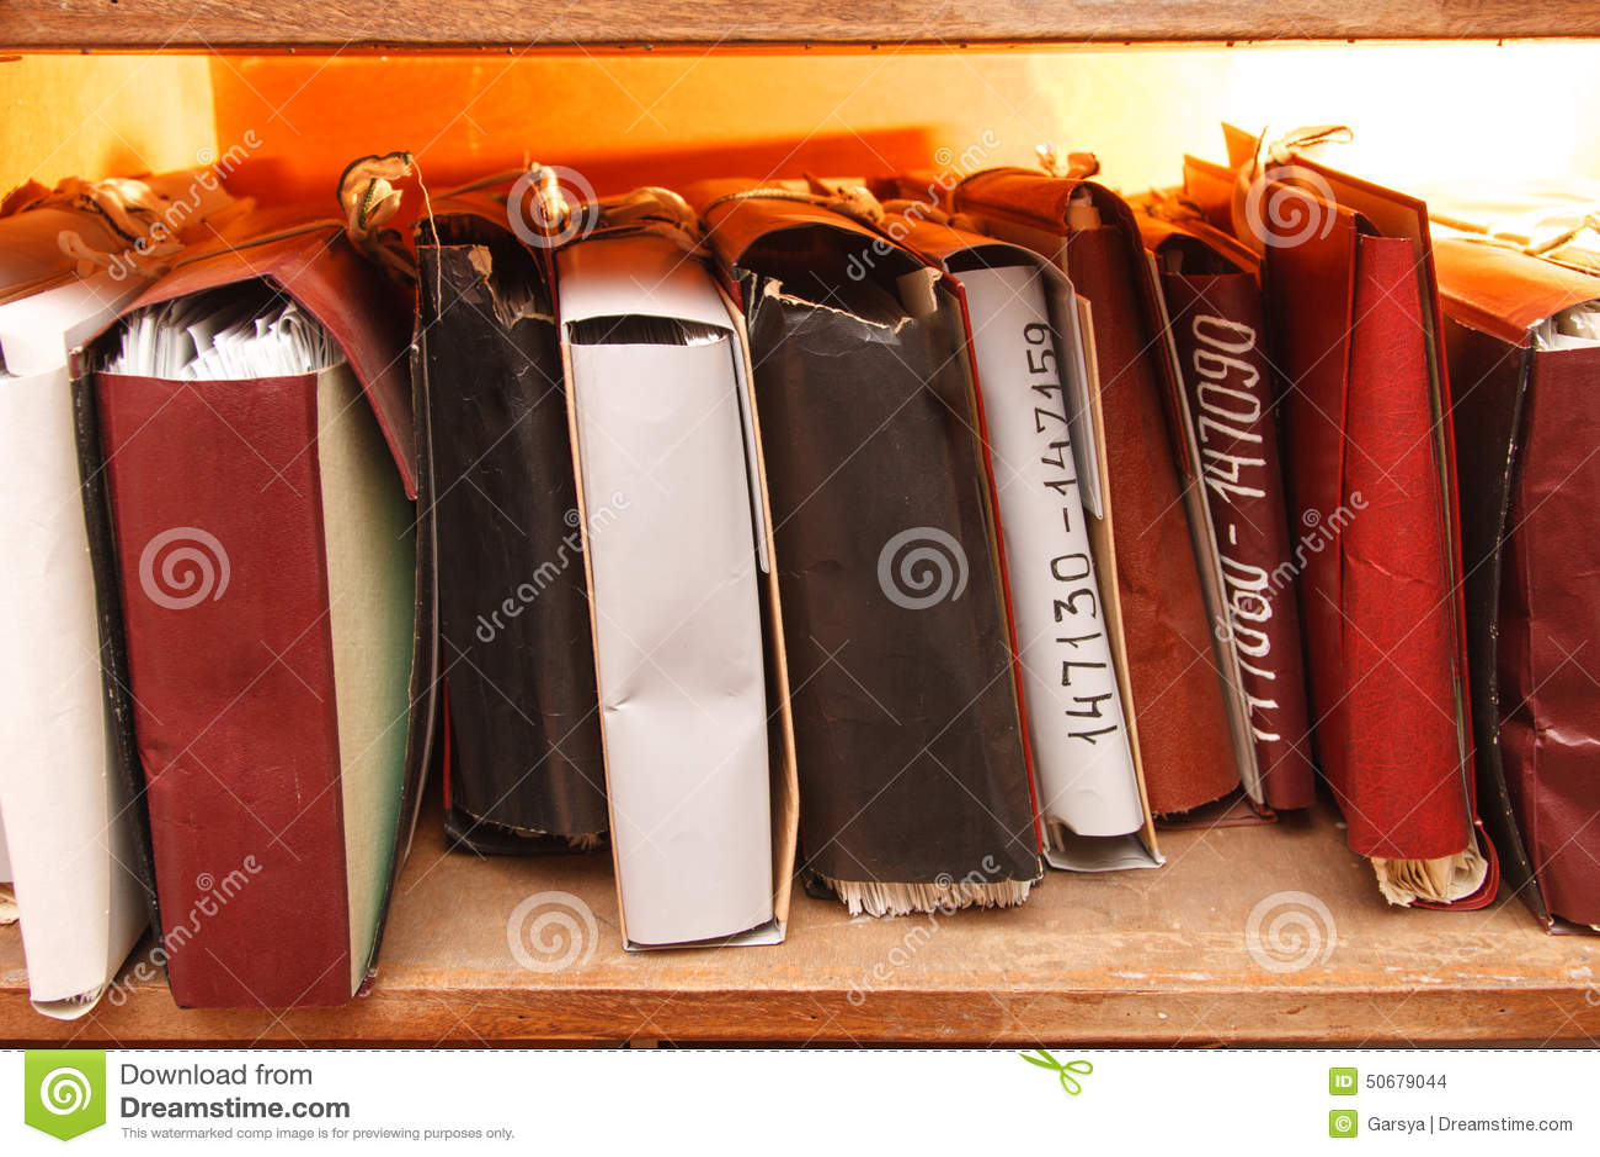 Download 在档案里堆积的纸张文件 库存照片. 图片 包括有 管理, 保留, 存贮, 记录, 寄存器, 学习, 工作 - 50679044